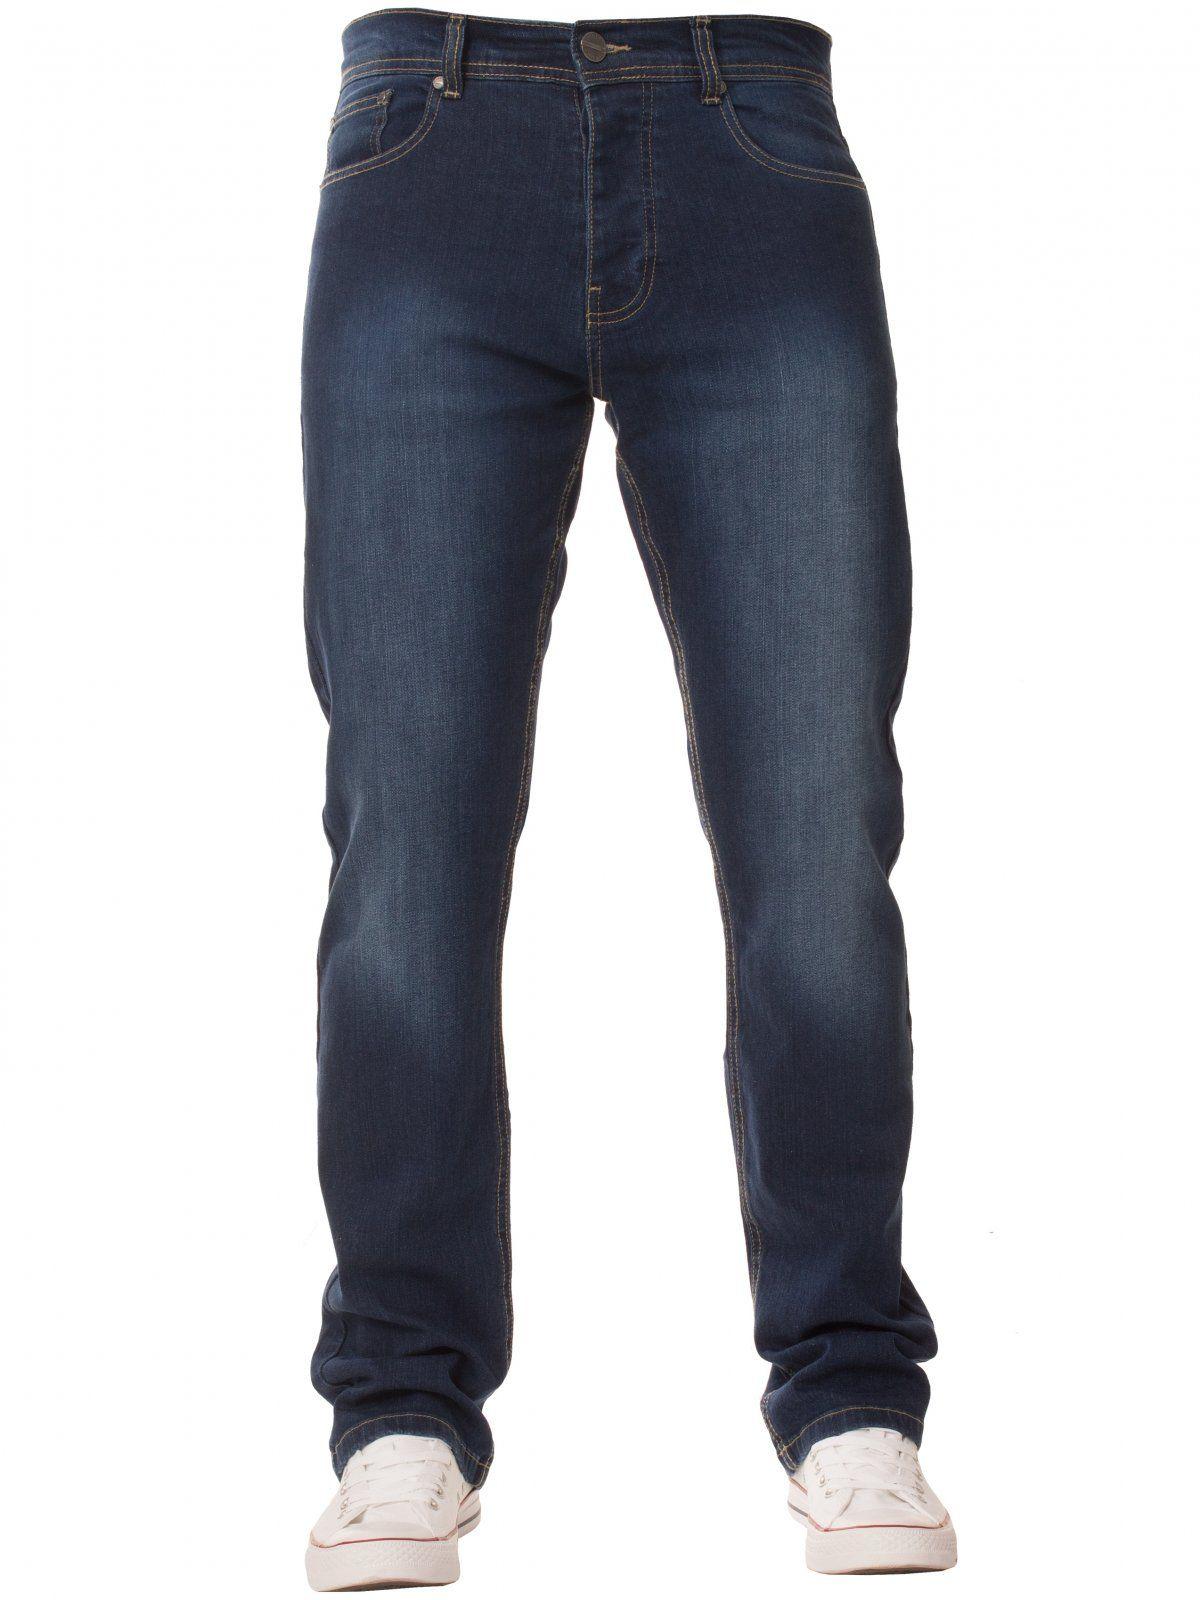 Mens  Regular Fit Stretch Denim Jeans | Enzo Designer Menswear